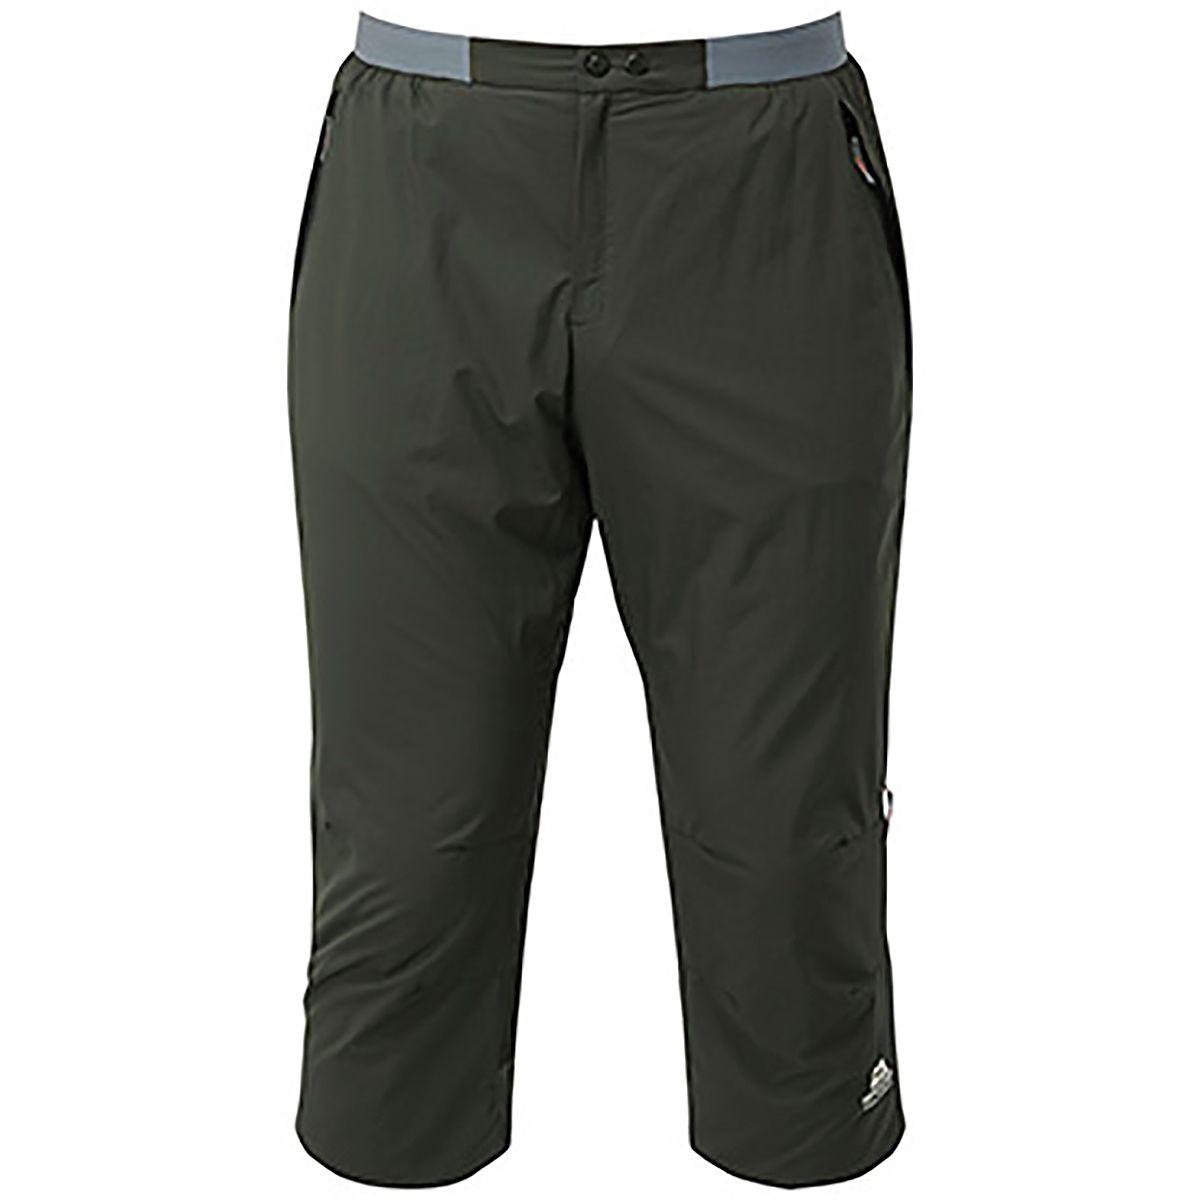 Mountain Equipment Kinesis 3/4 Pant